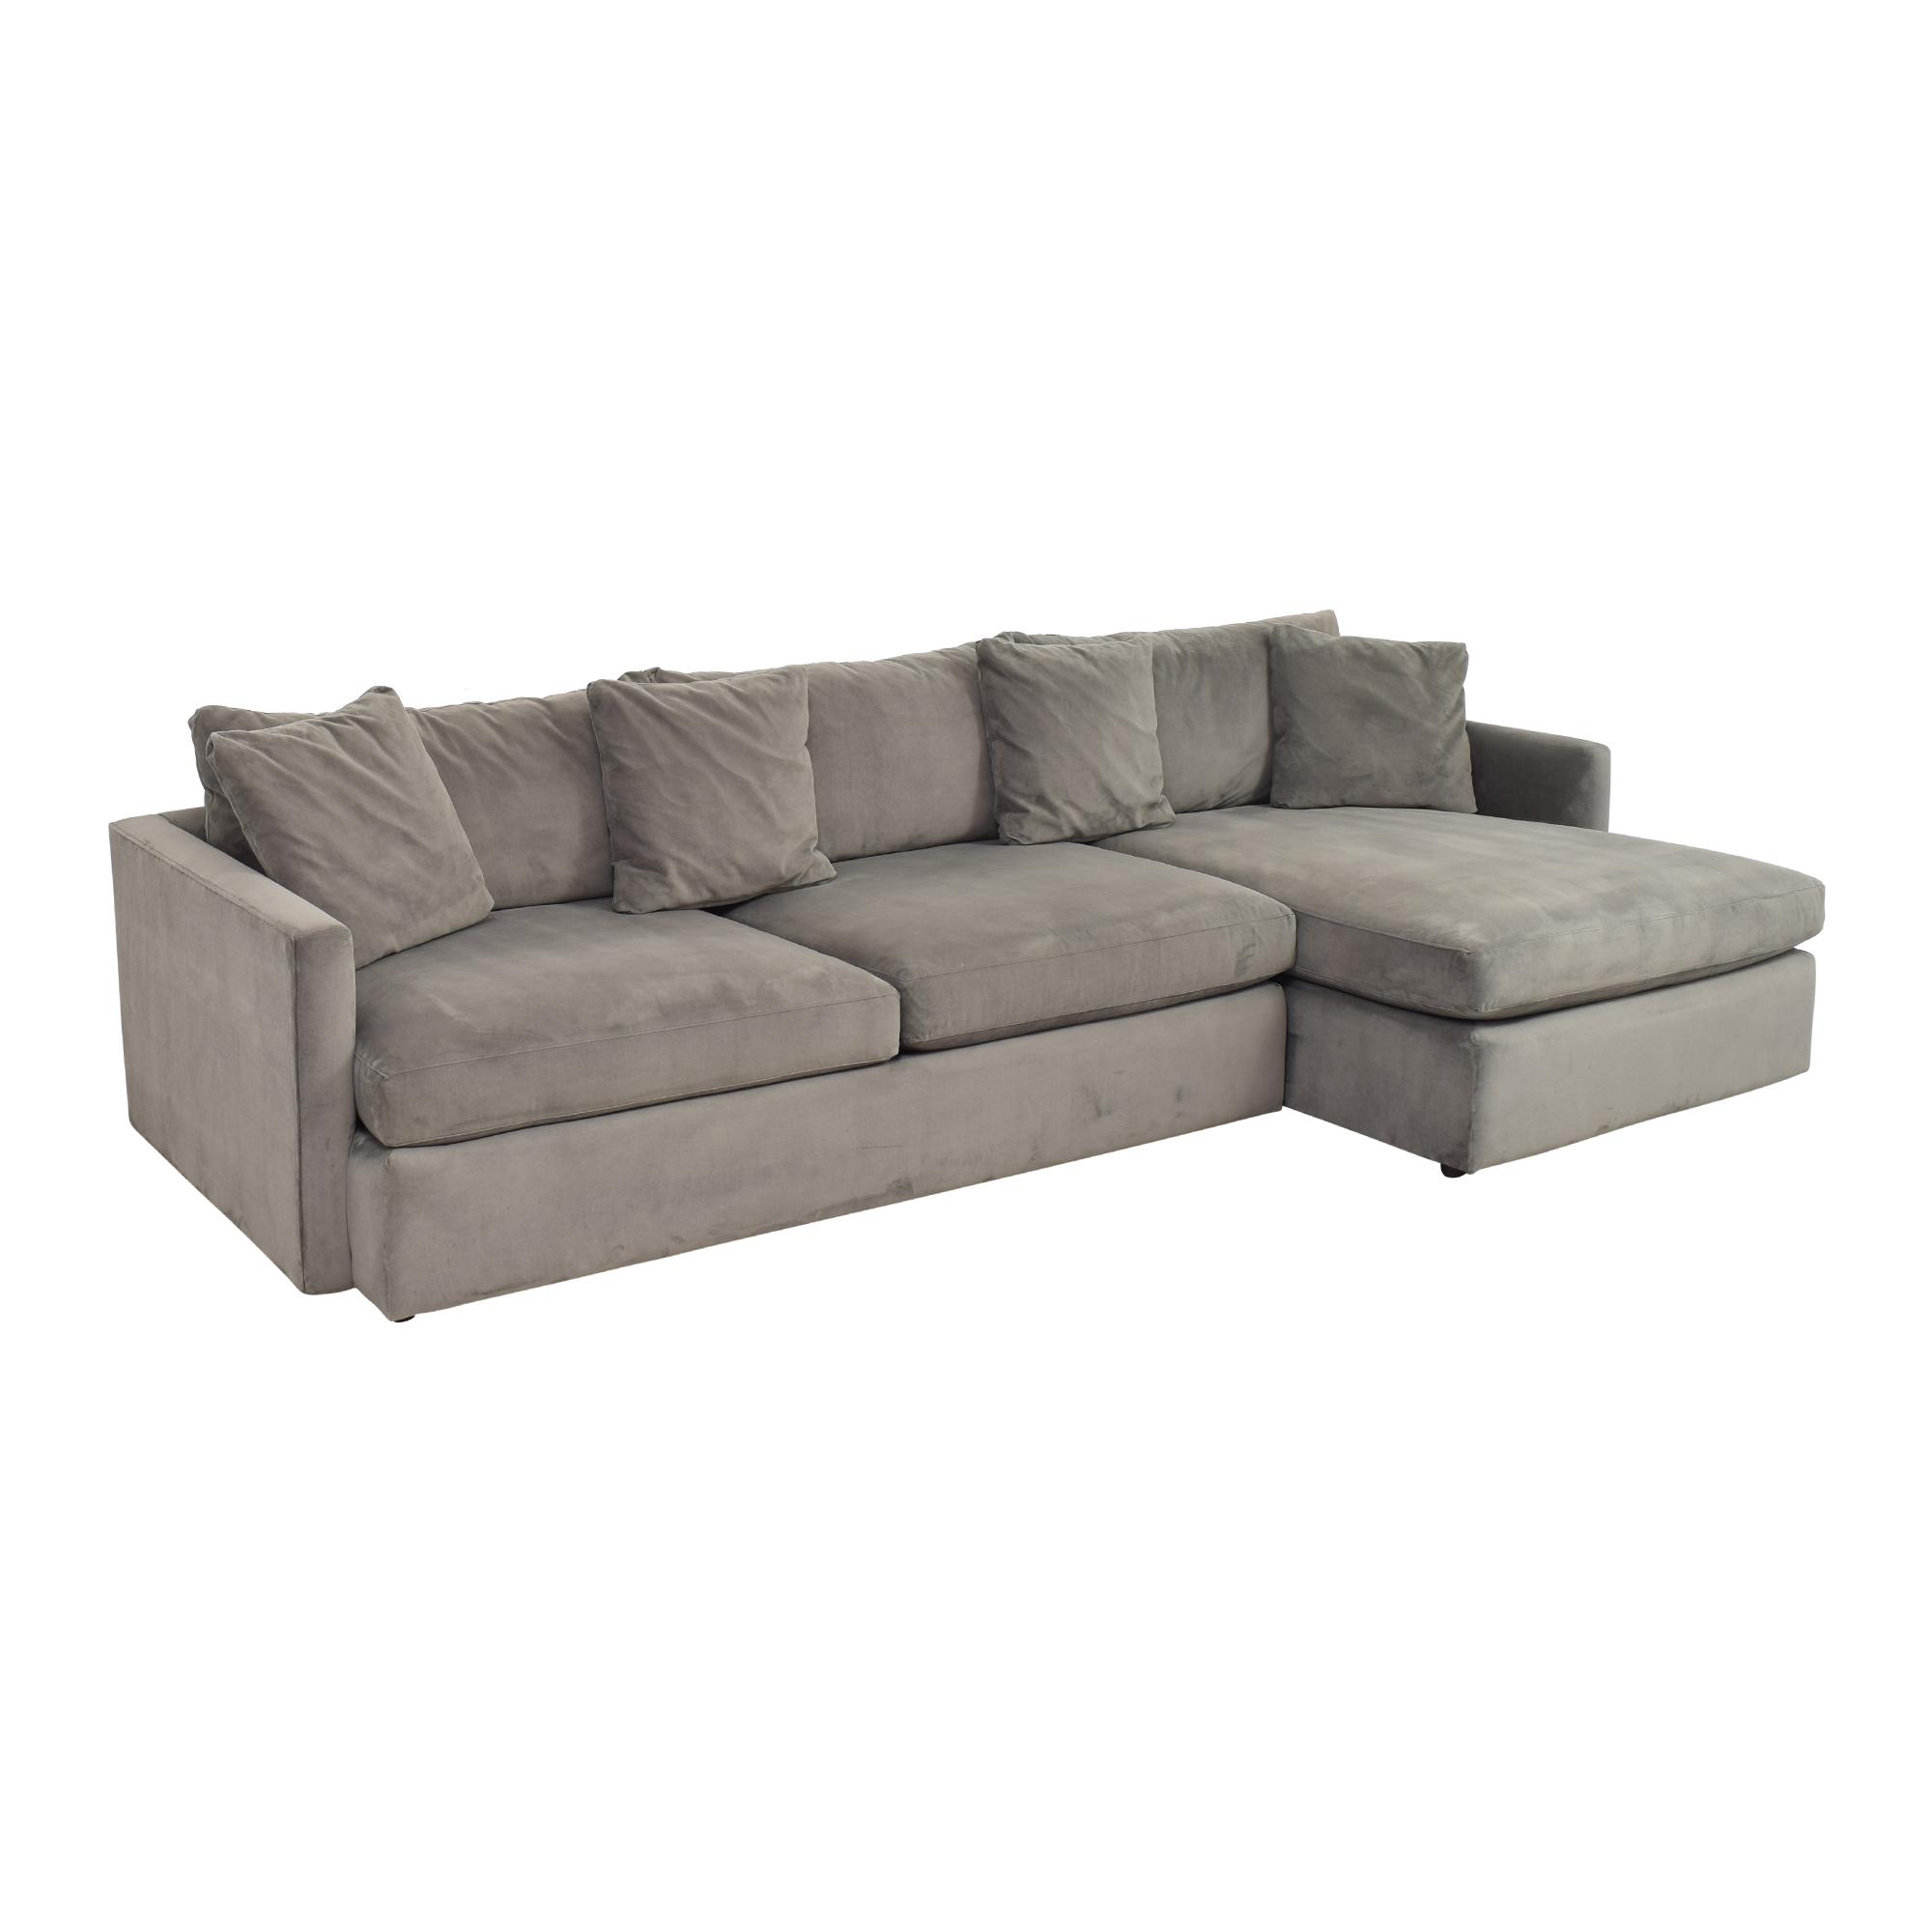 shop Crate & Barrel Lounge II Chaise Sectional Sofa Crate & Barrel